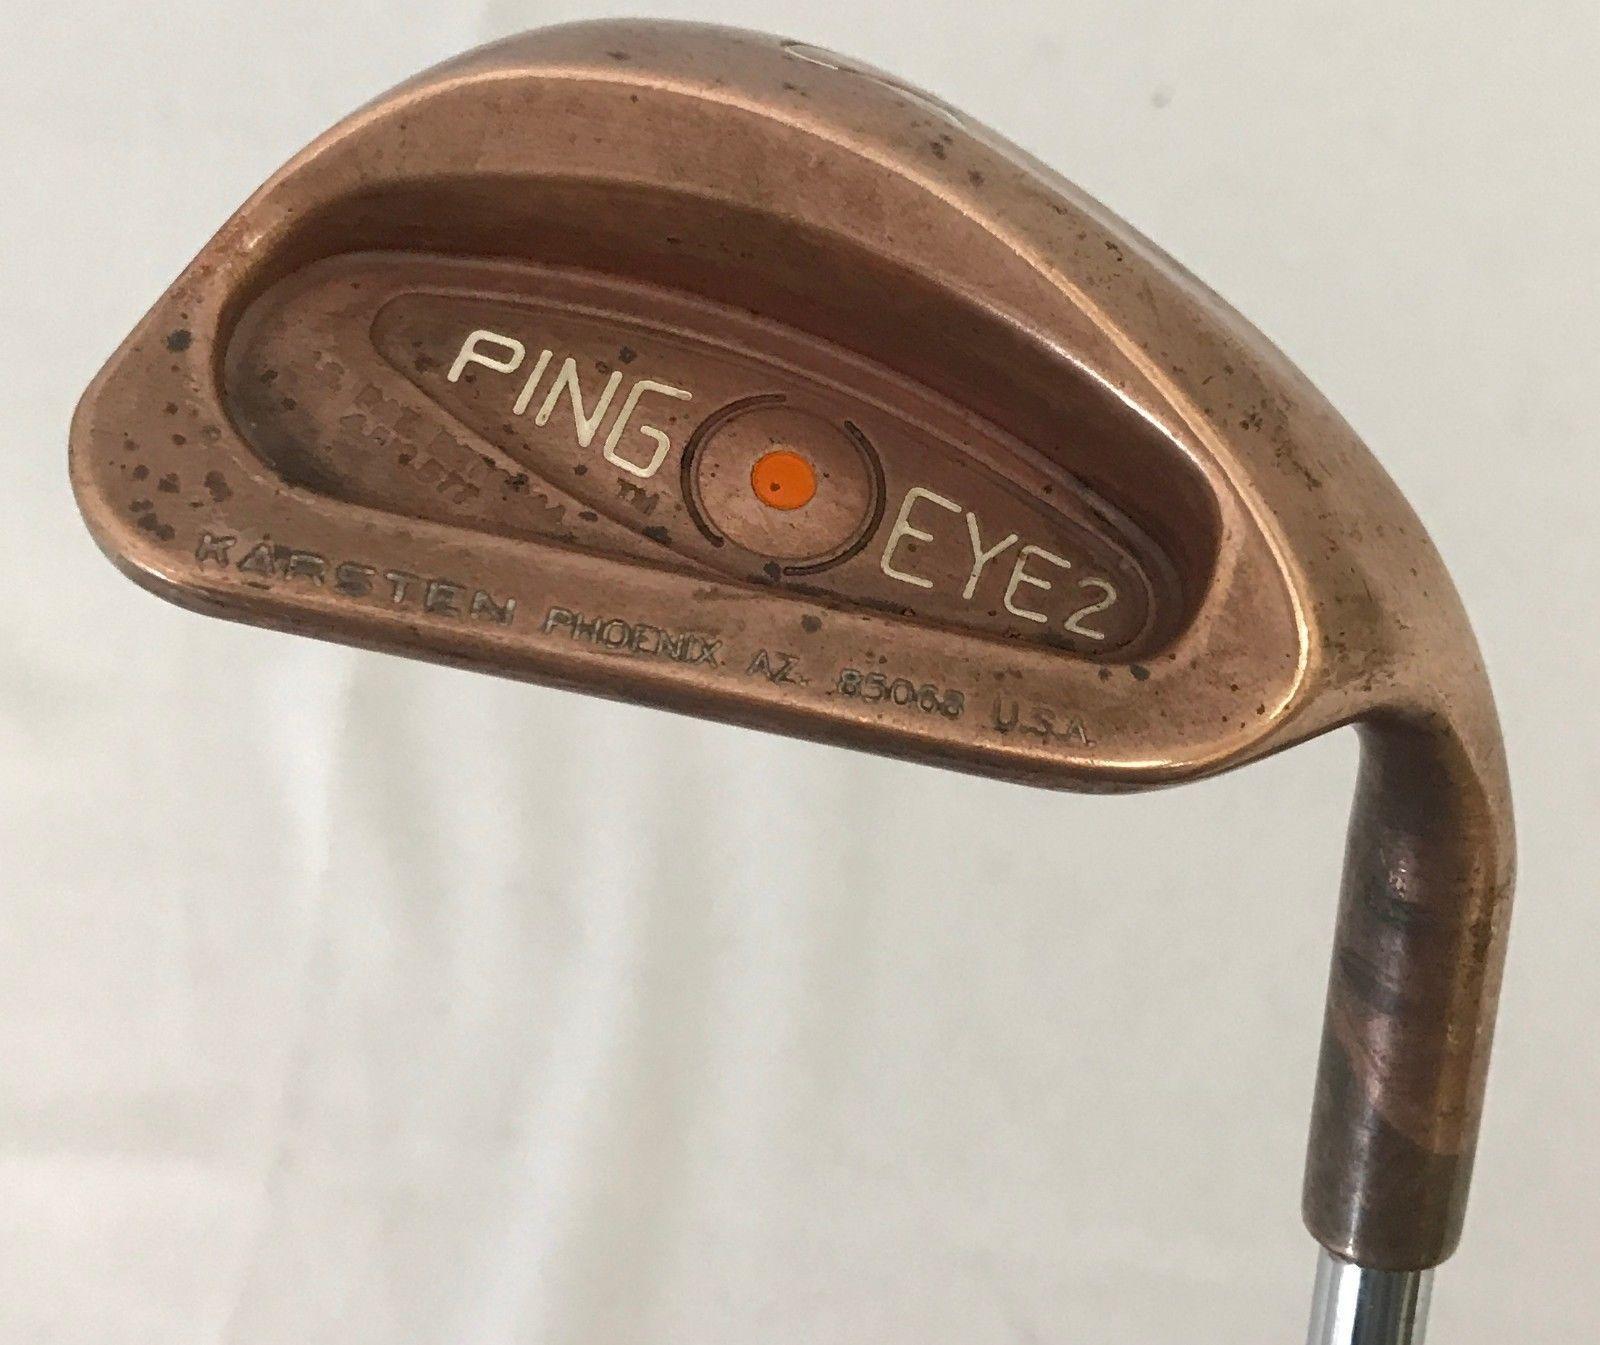 Ping Eye 2 Beryllium Copper Sand Wedge True Temper Steel Regular Flex